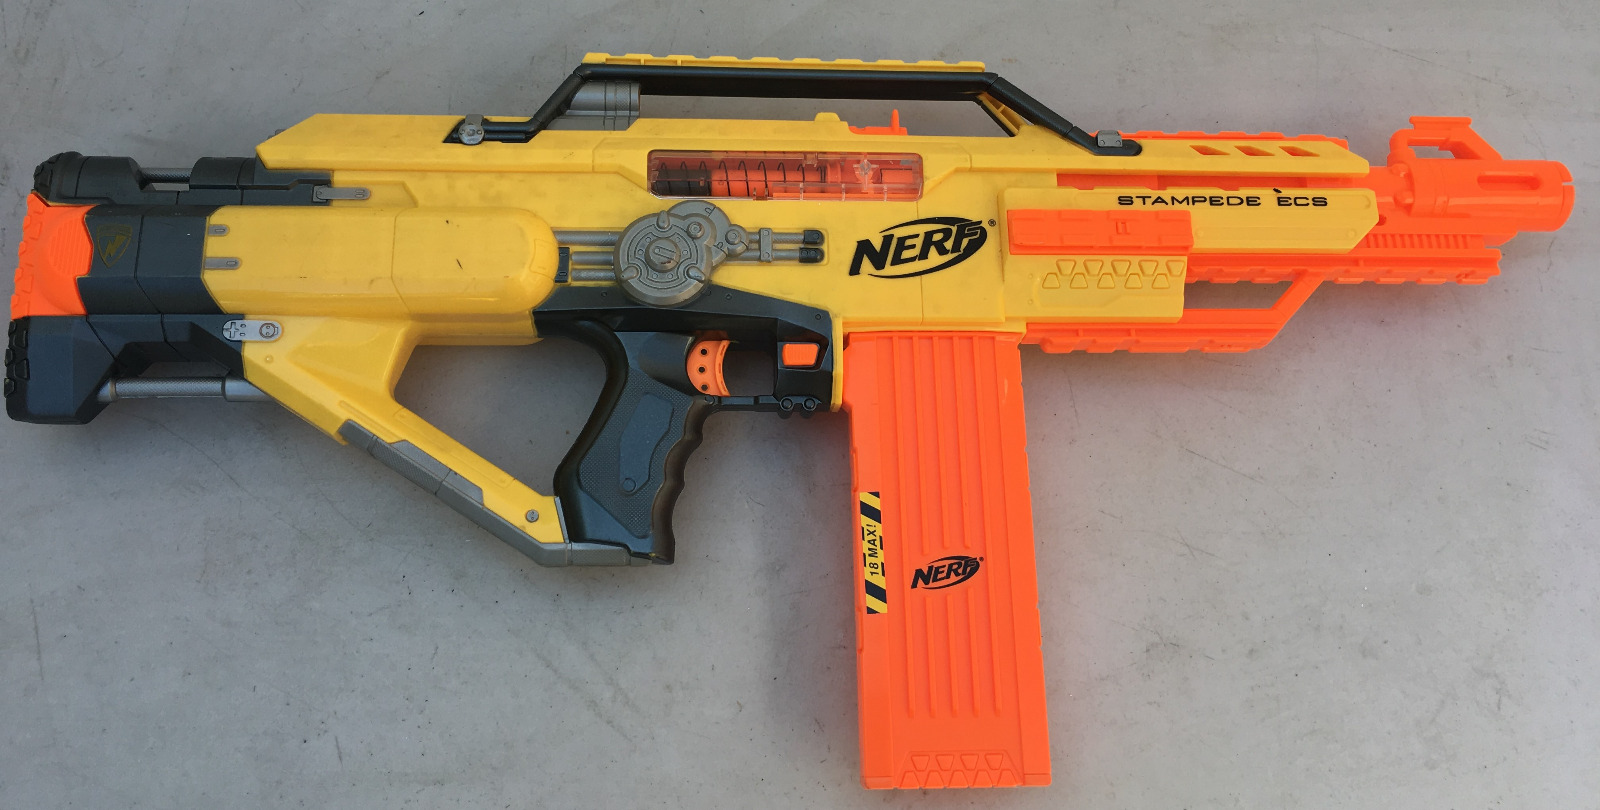 Hasbro 2010 Nerf N Strike Stampede Ecs Automatic Blaster